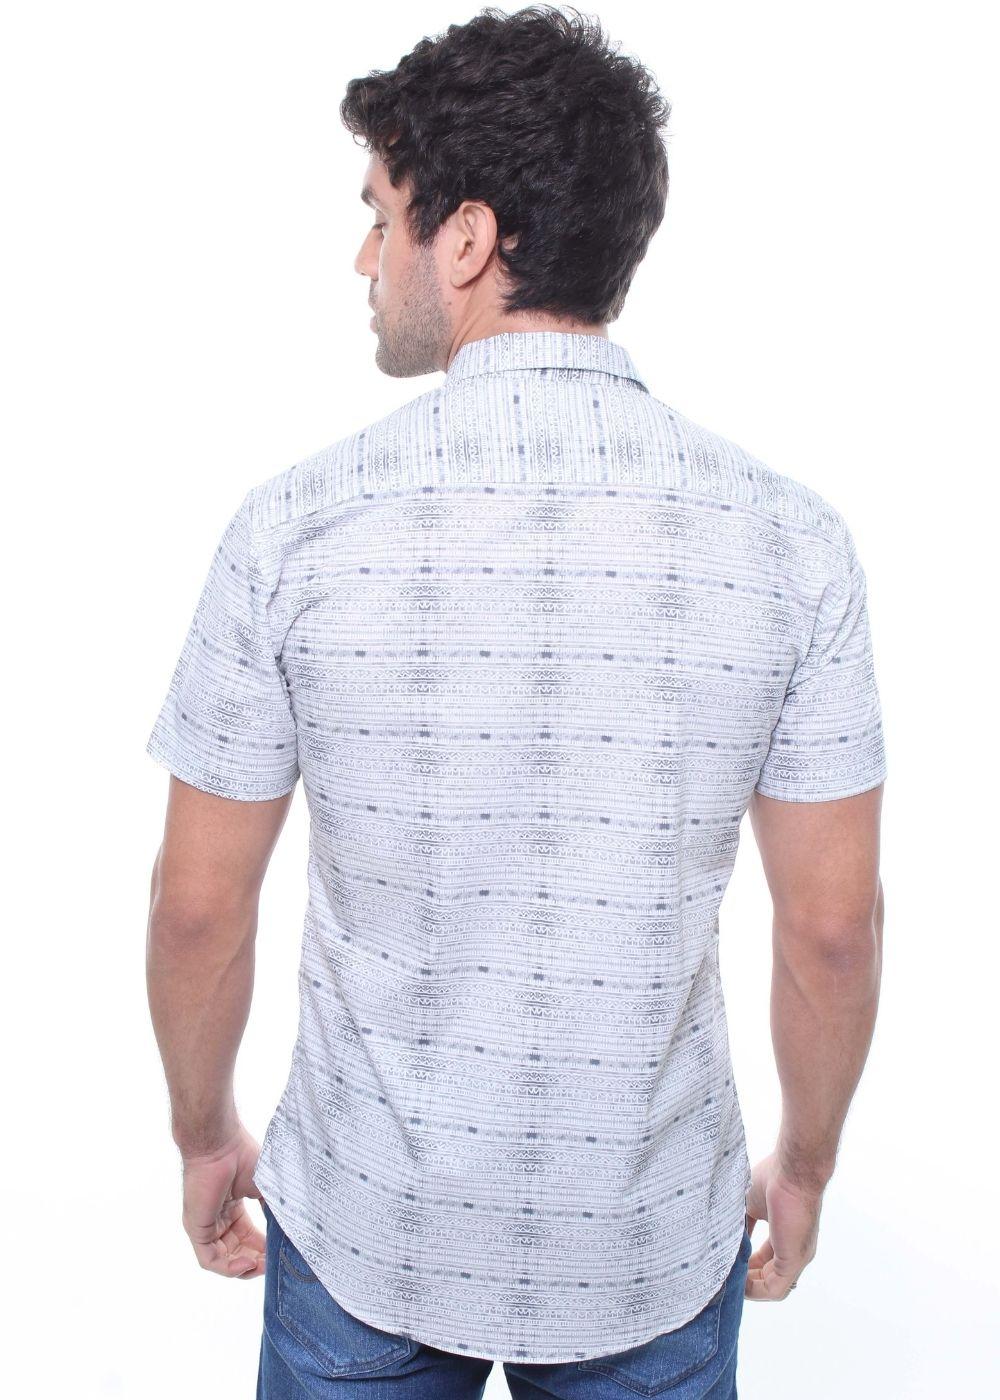 Camisa Masculina Manga Curta Estampada Crocker - 47826